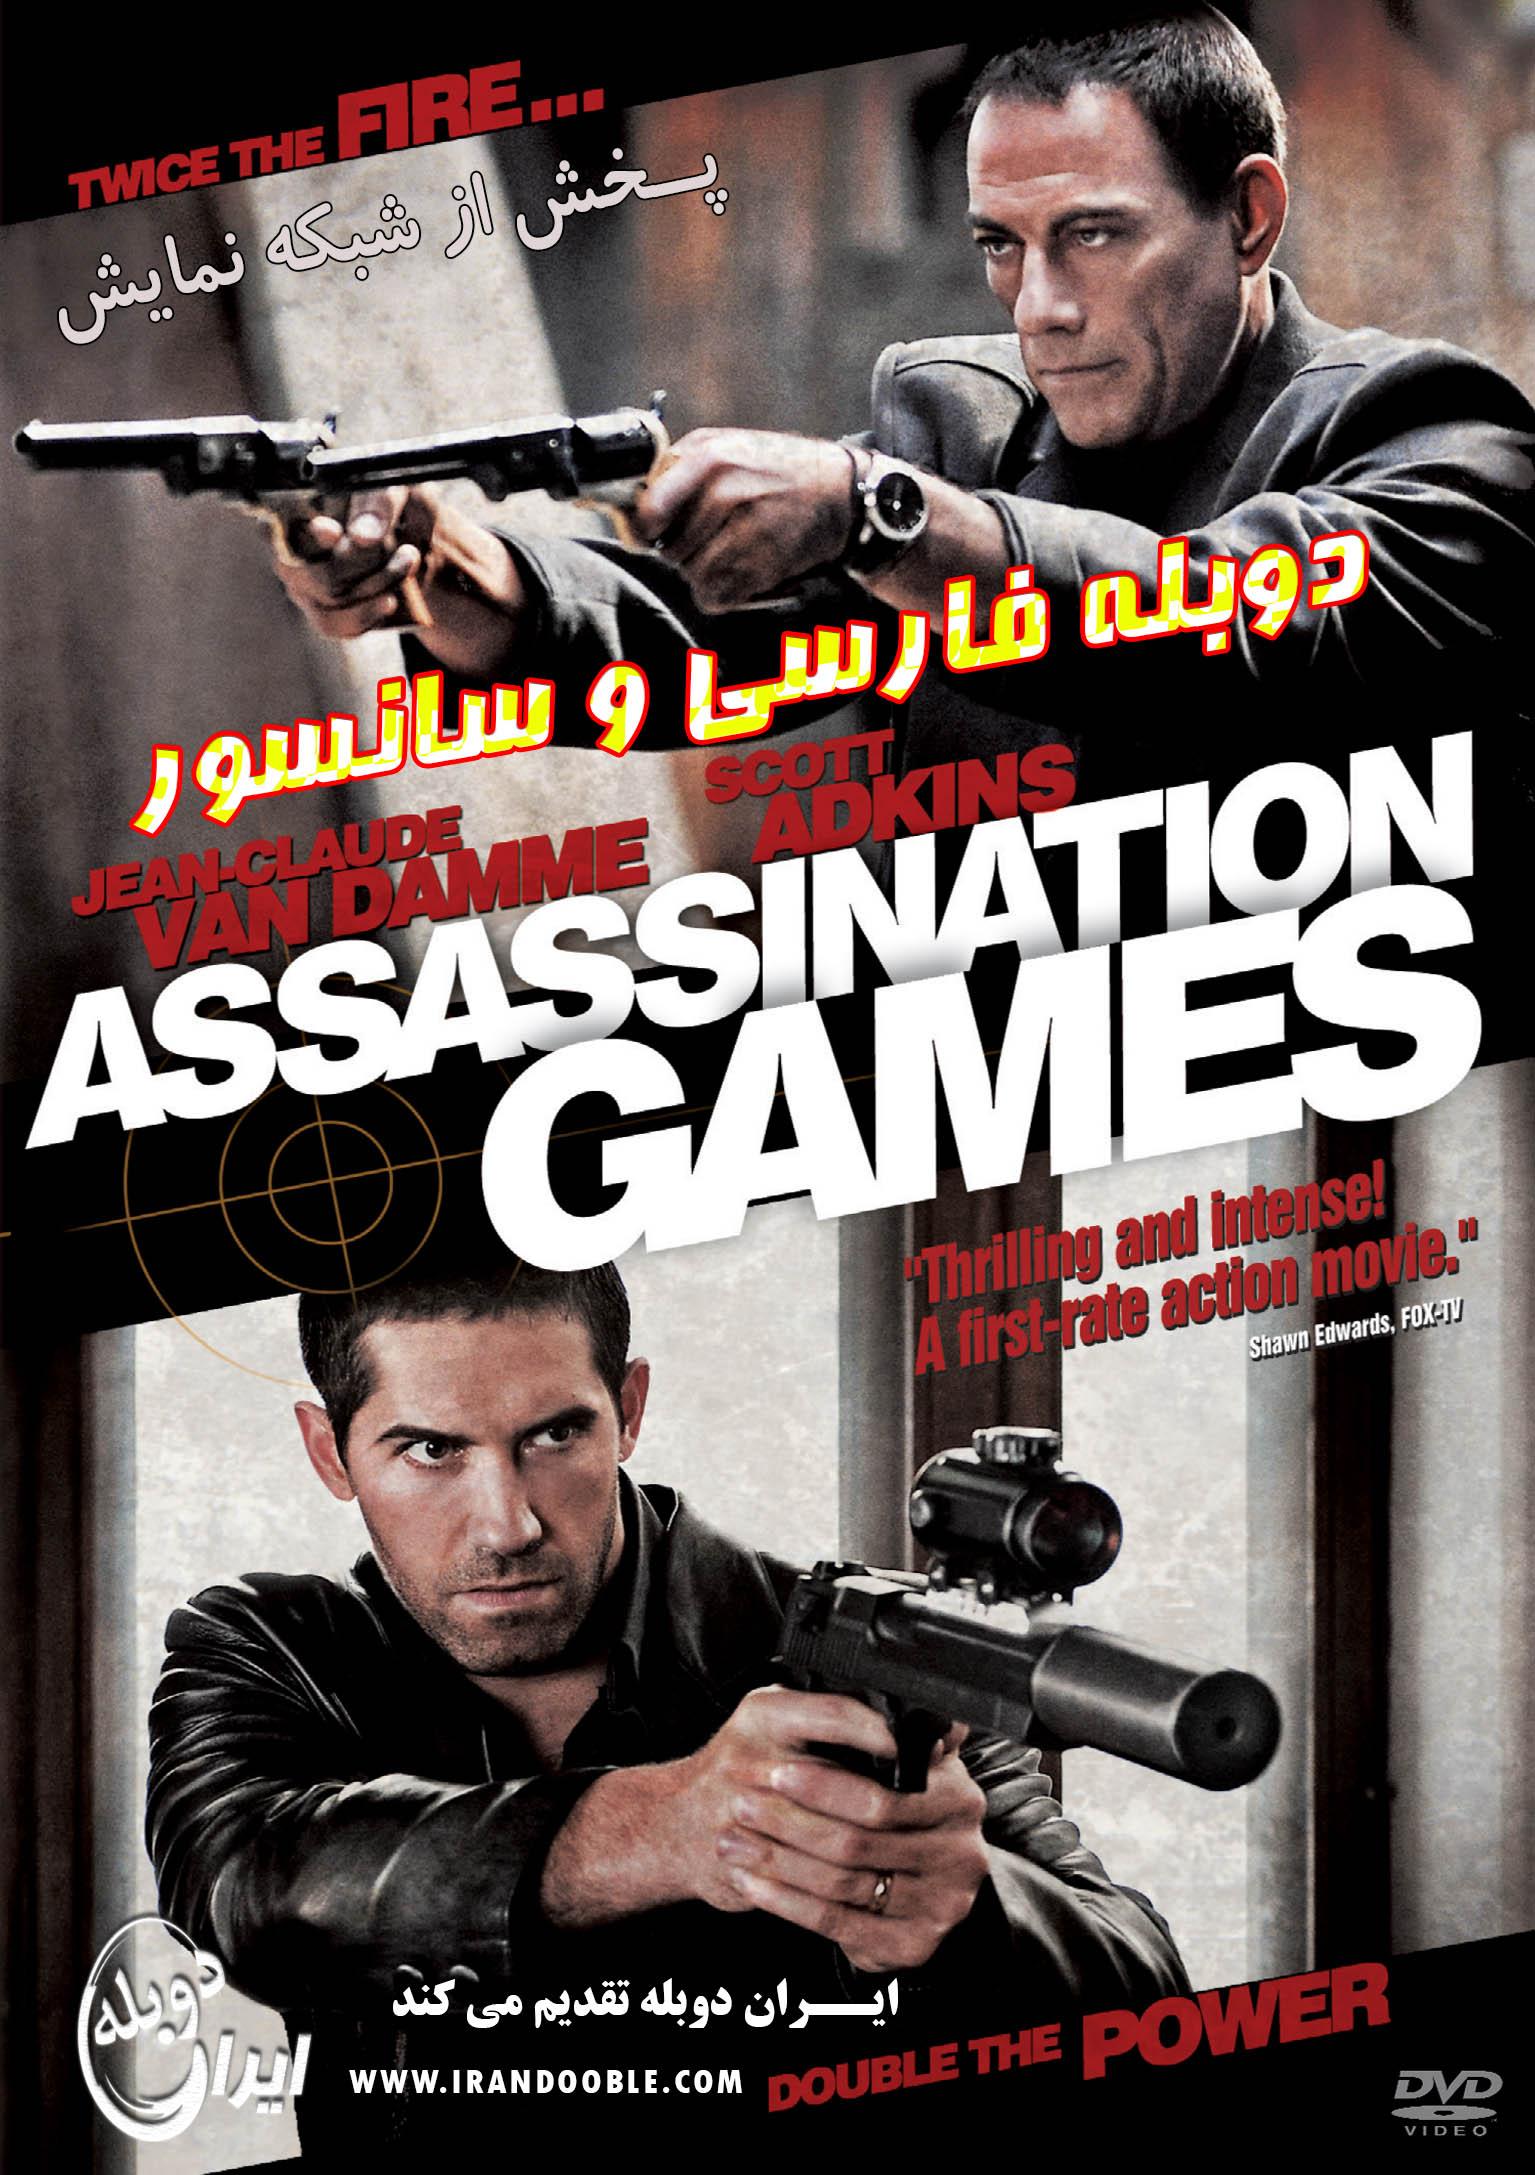 Assassination Games_2013-(www.irandooble.com)